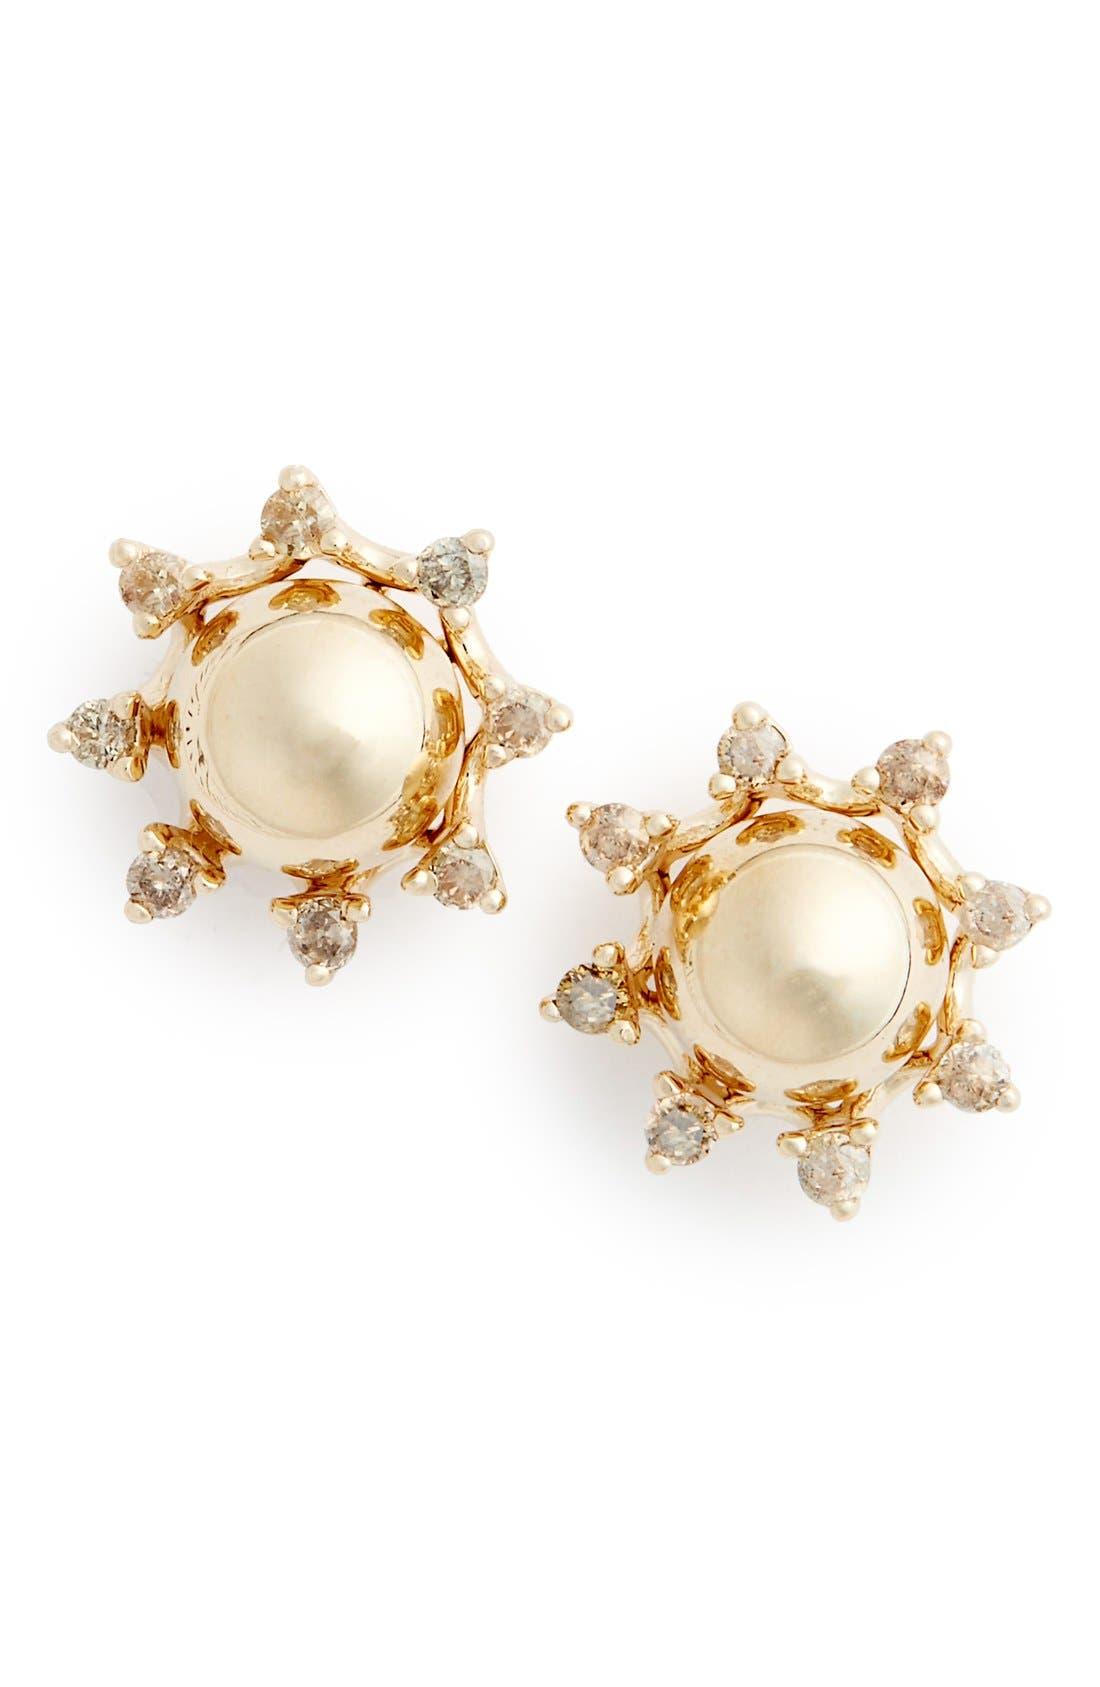 ANNA SHEFFIELD Starlight Champagne Diamond Stud Earrings